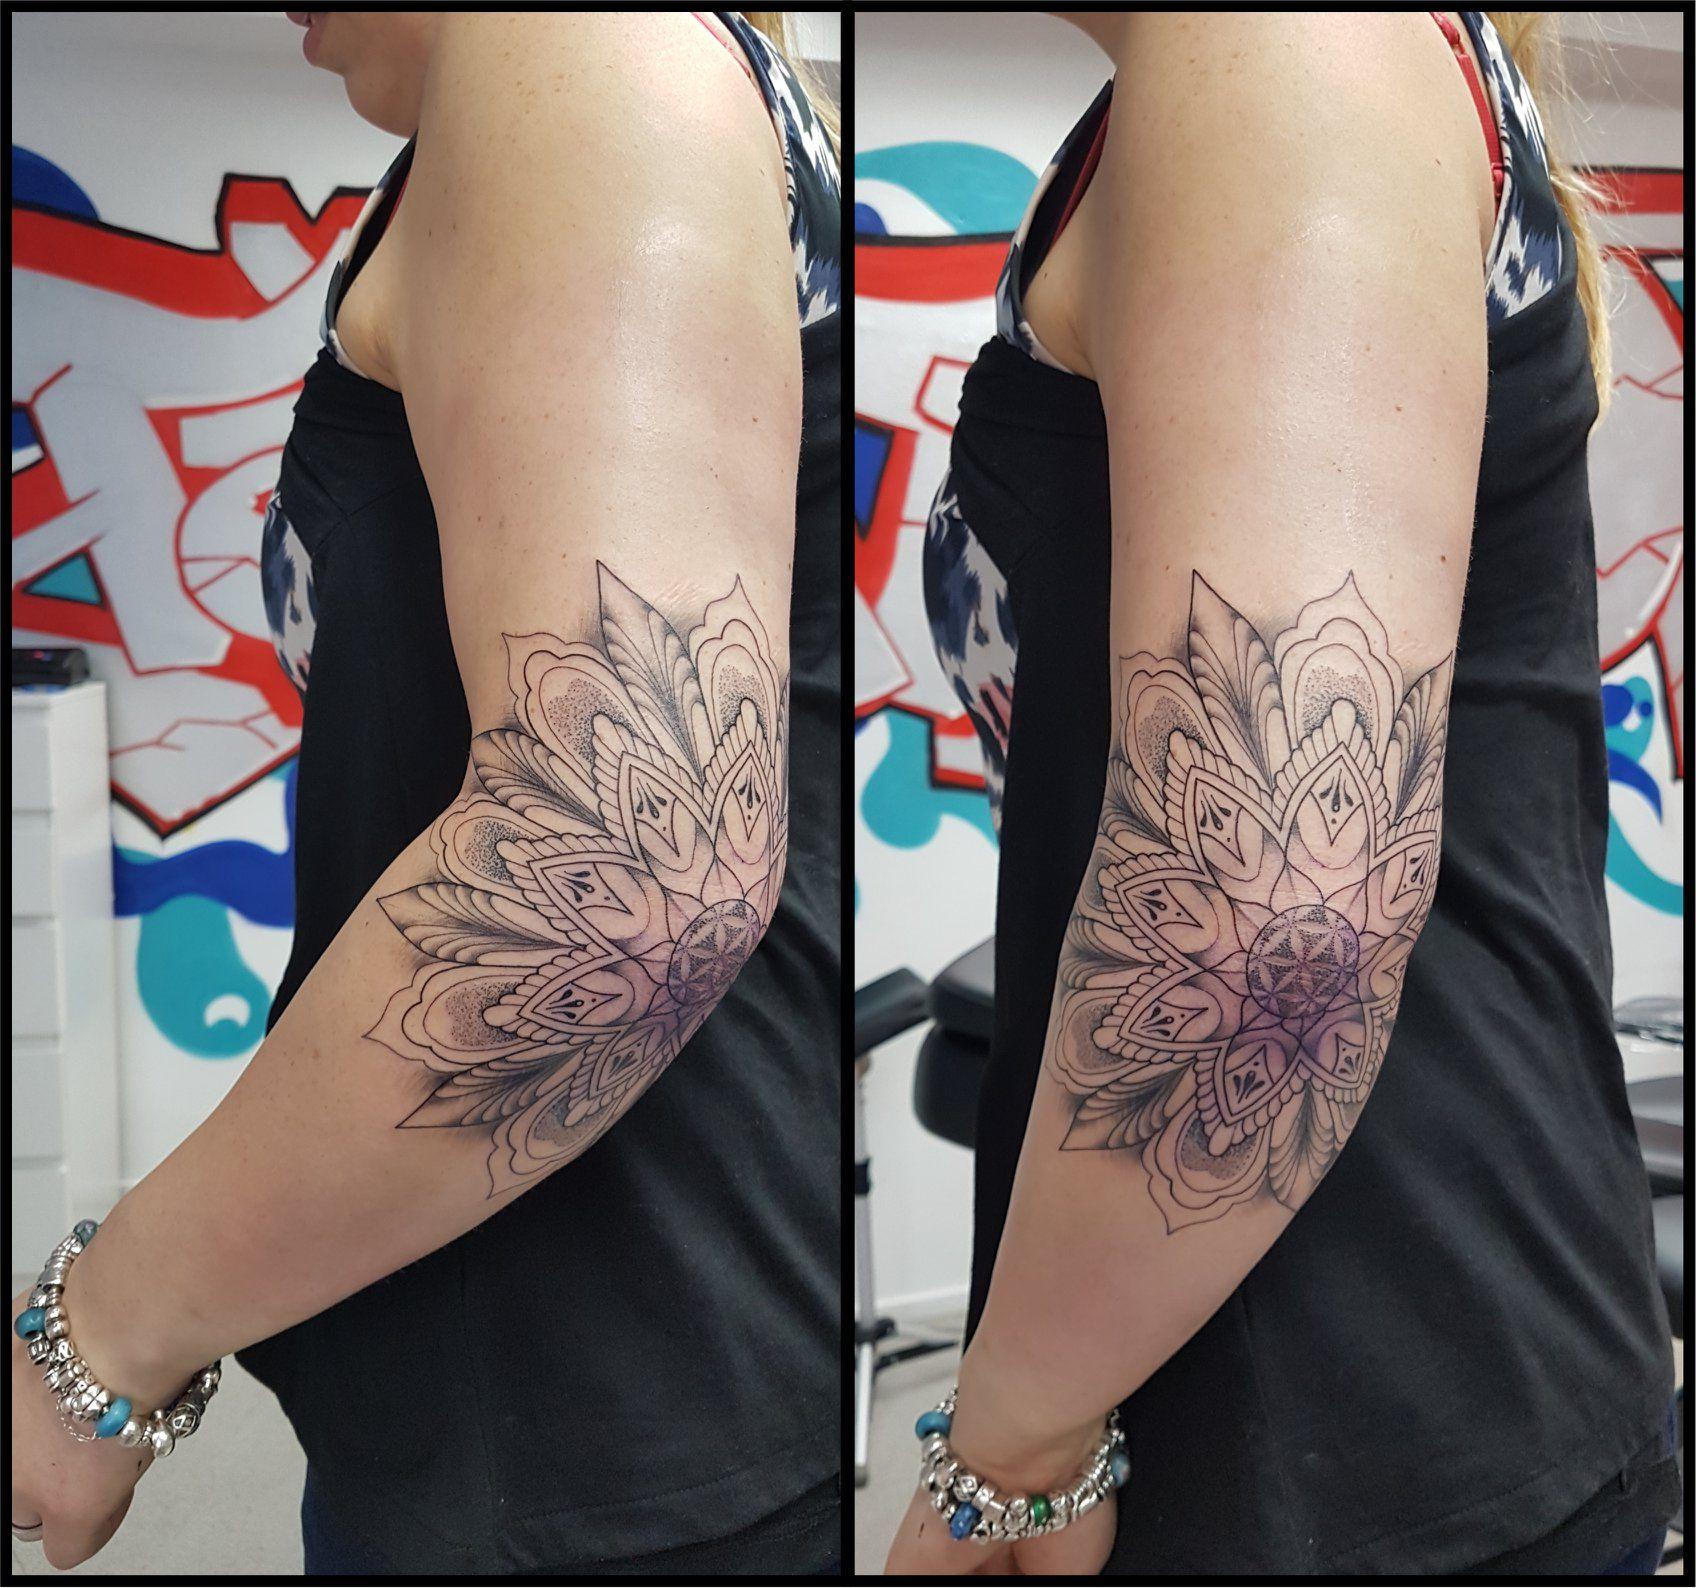 Mandala Female Elbow Tattoo Blackandgrey Flower Floweroflife Sleeve Female Elbow Tattoos Tattoos Tattoos For Women